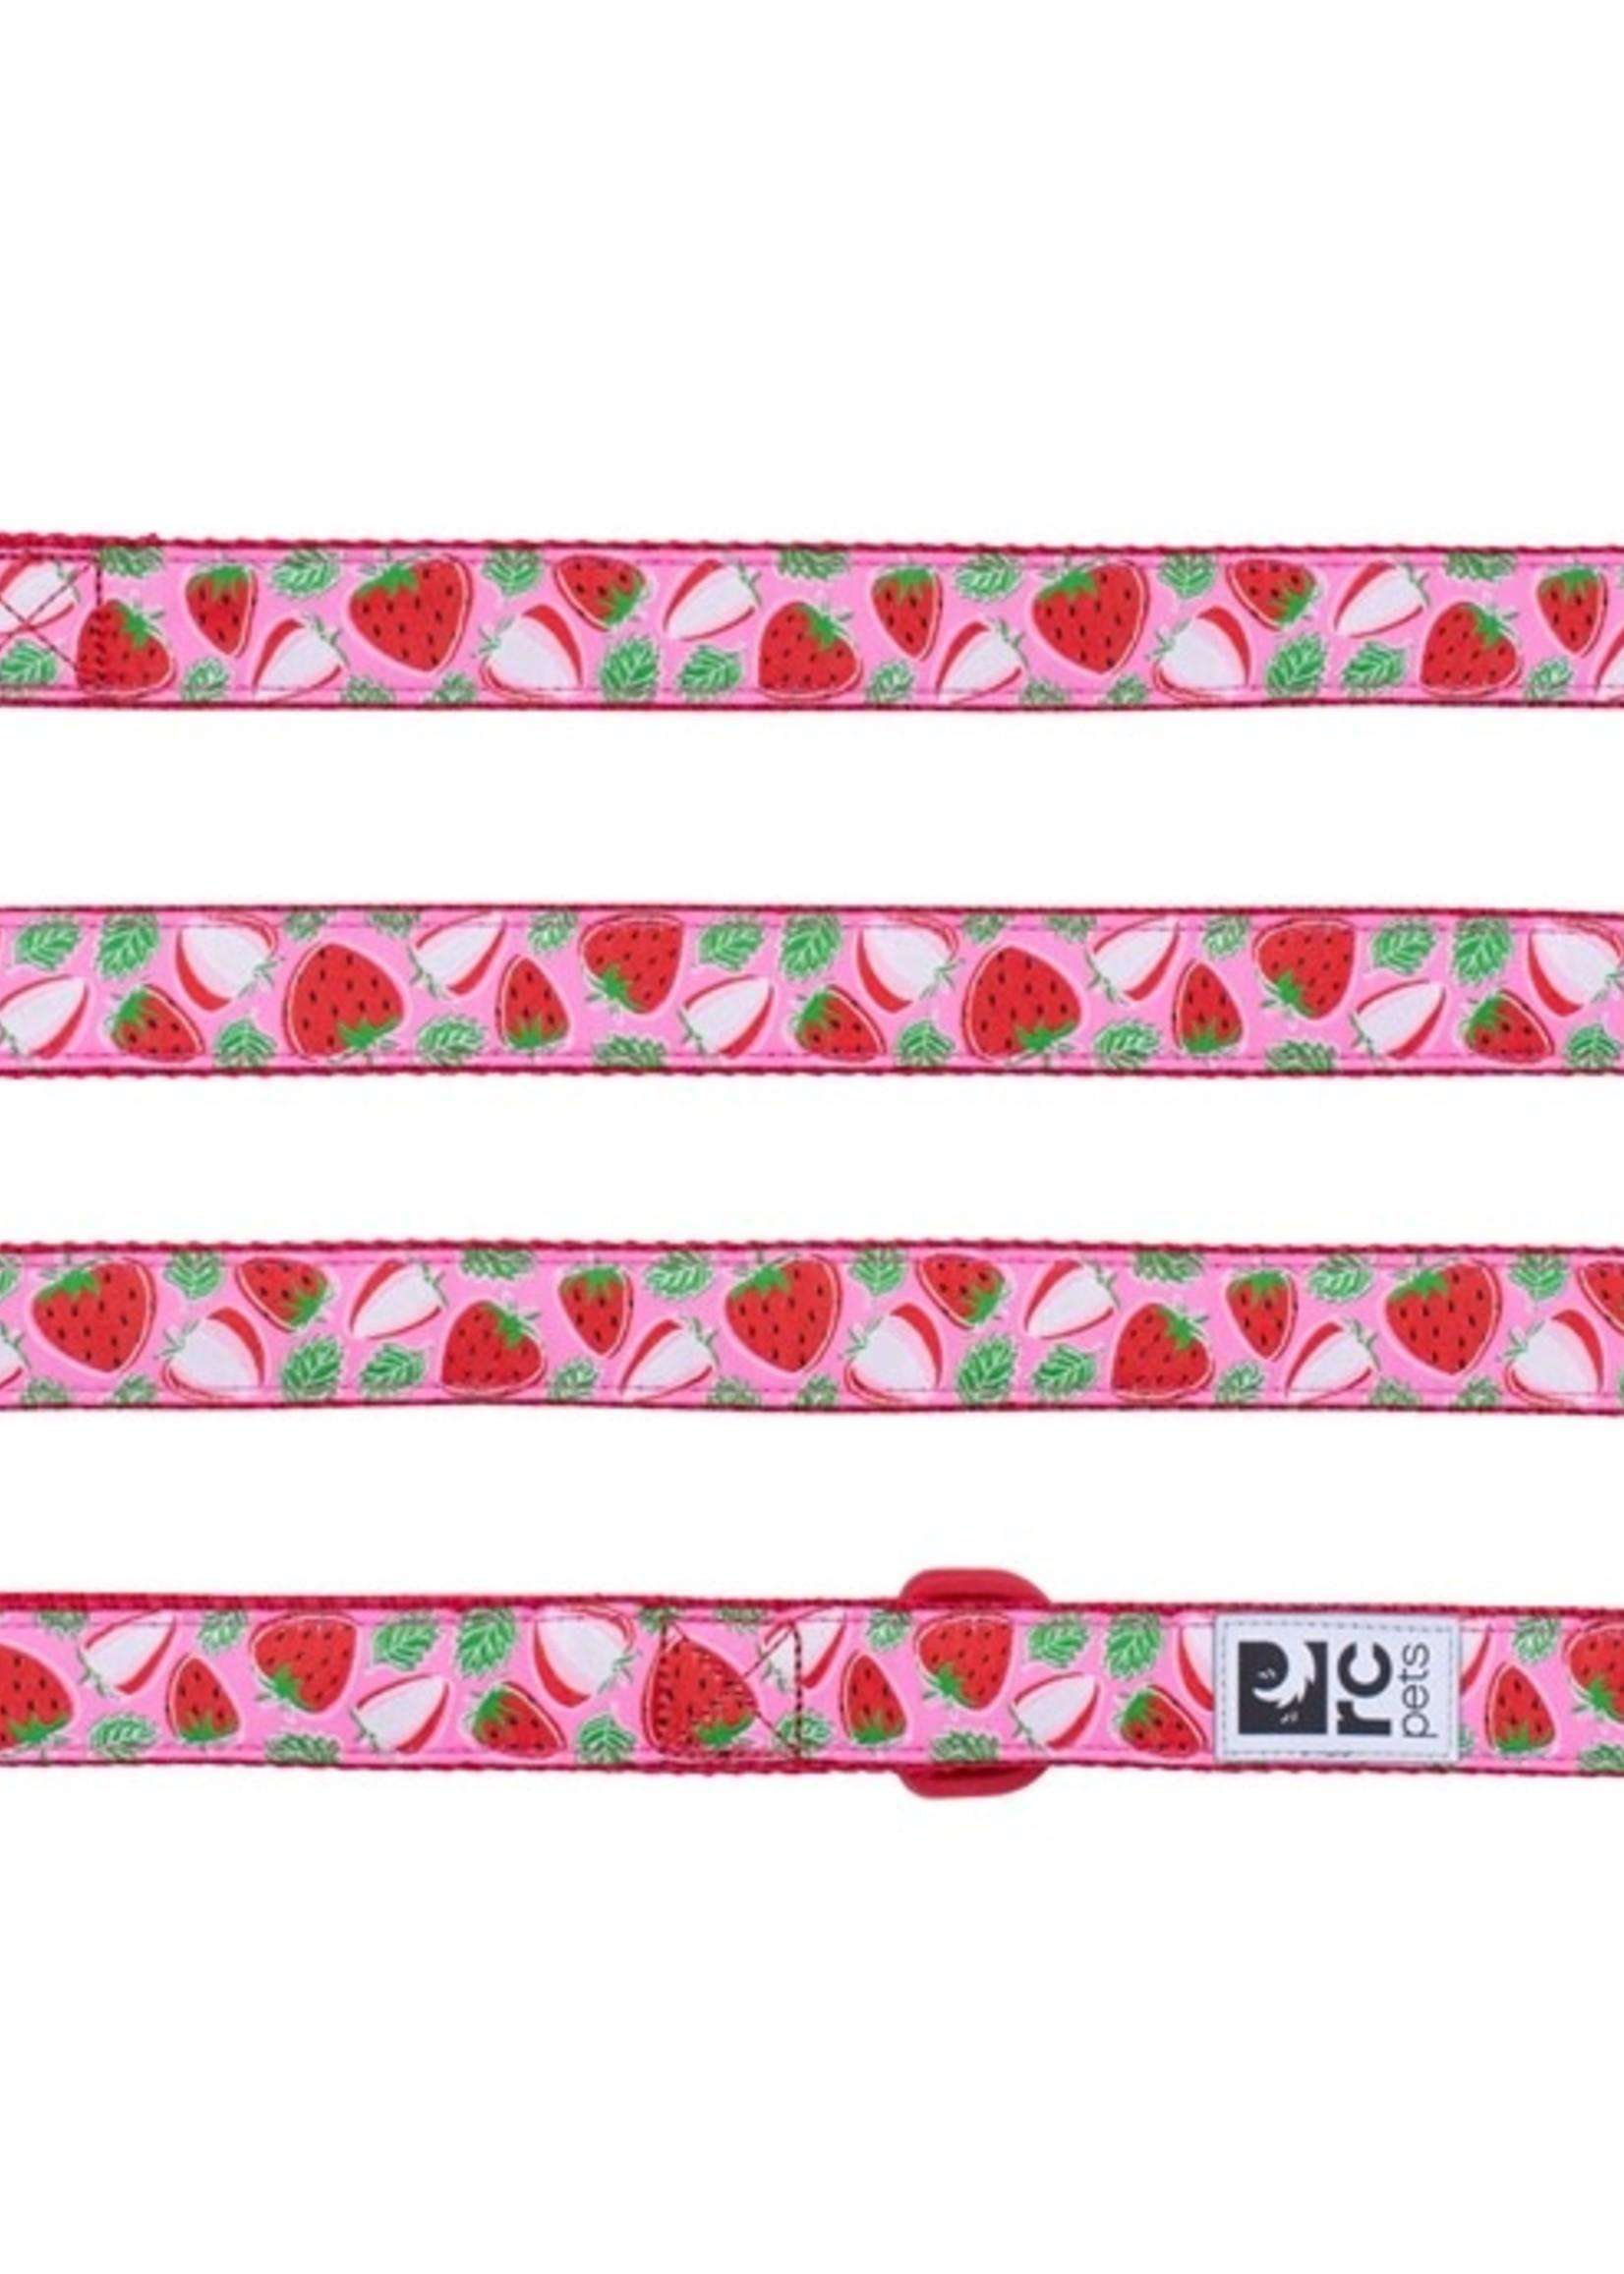 RC Pets Leash 1x6 Strawberries